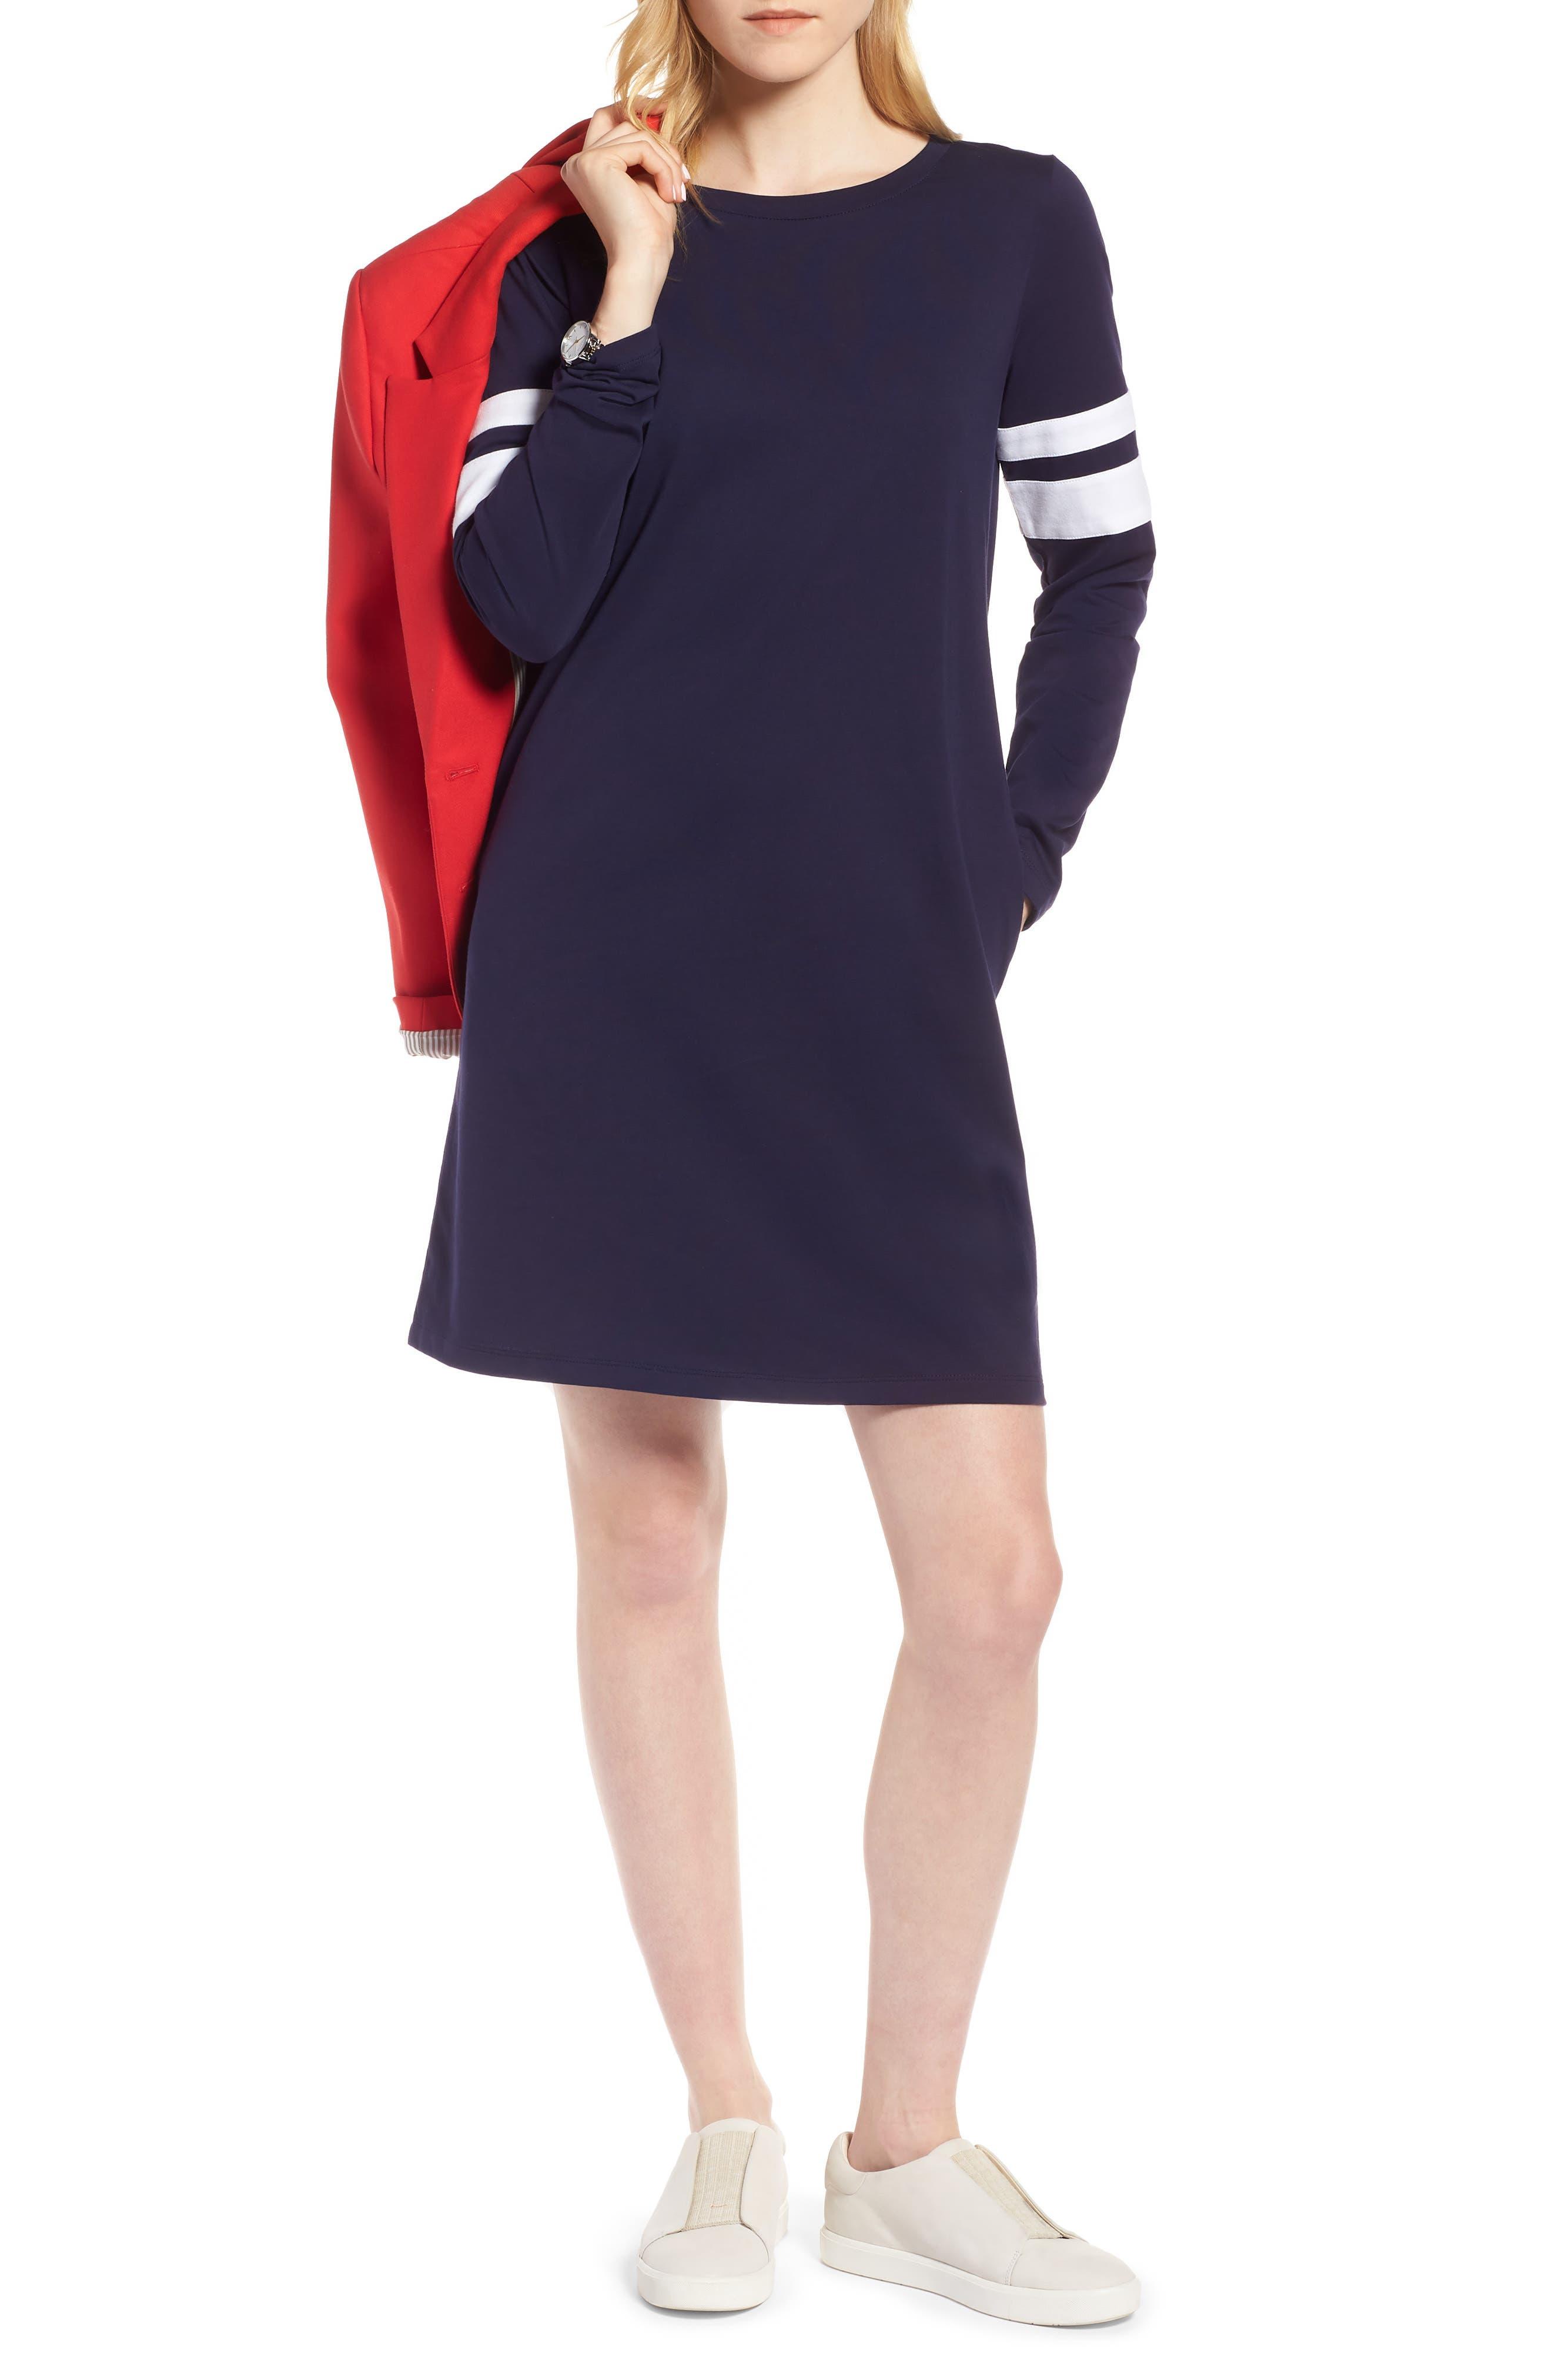 Varsity Knit Shift Dress,                         Main,                         color, Navy- White Combo